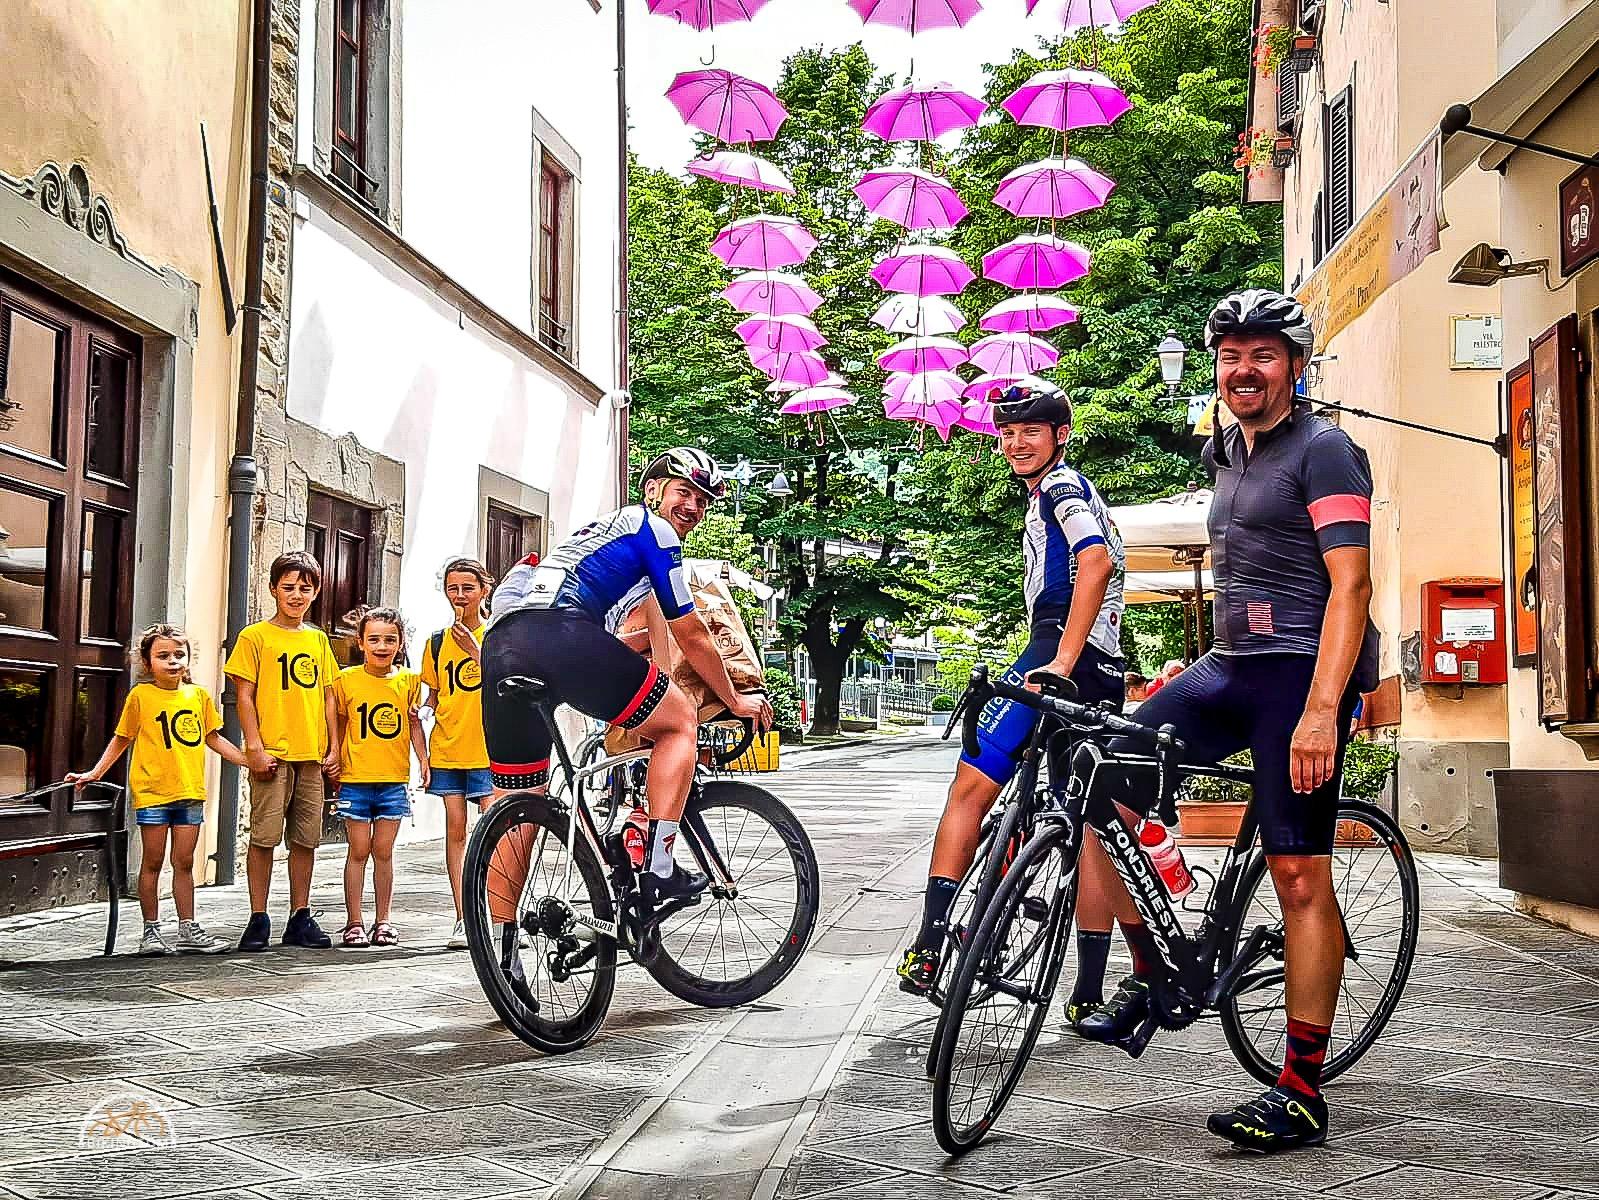 Emilia Romagna,Cycling,Fahrrad,Italien,bikingtom, Hotel Tosco Romagnolo